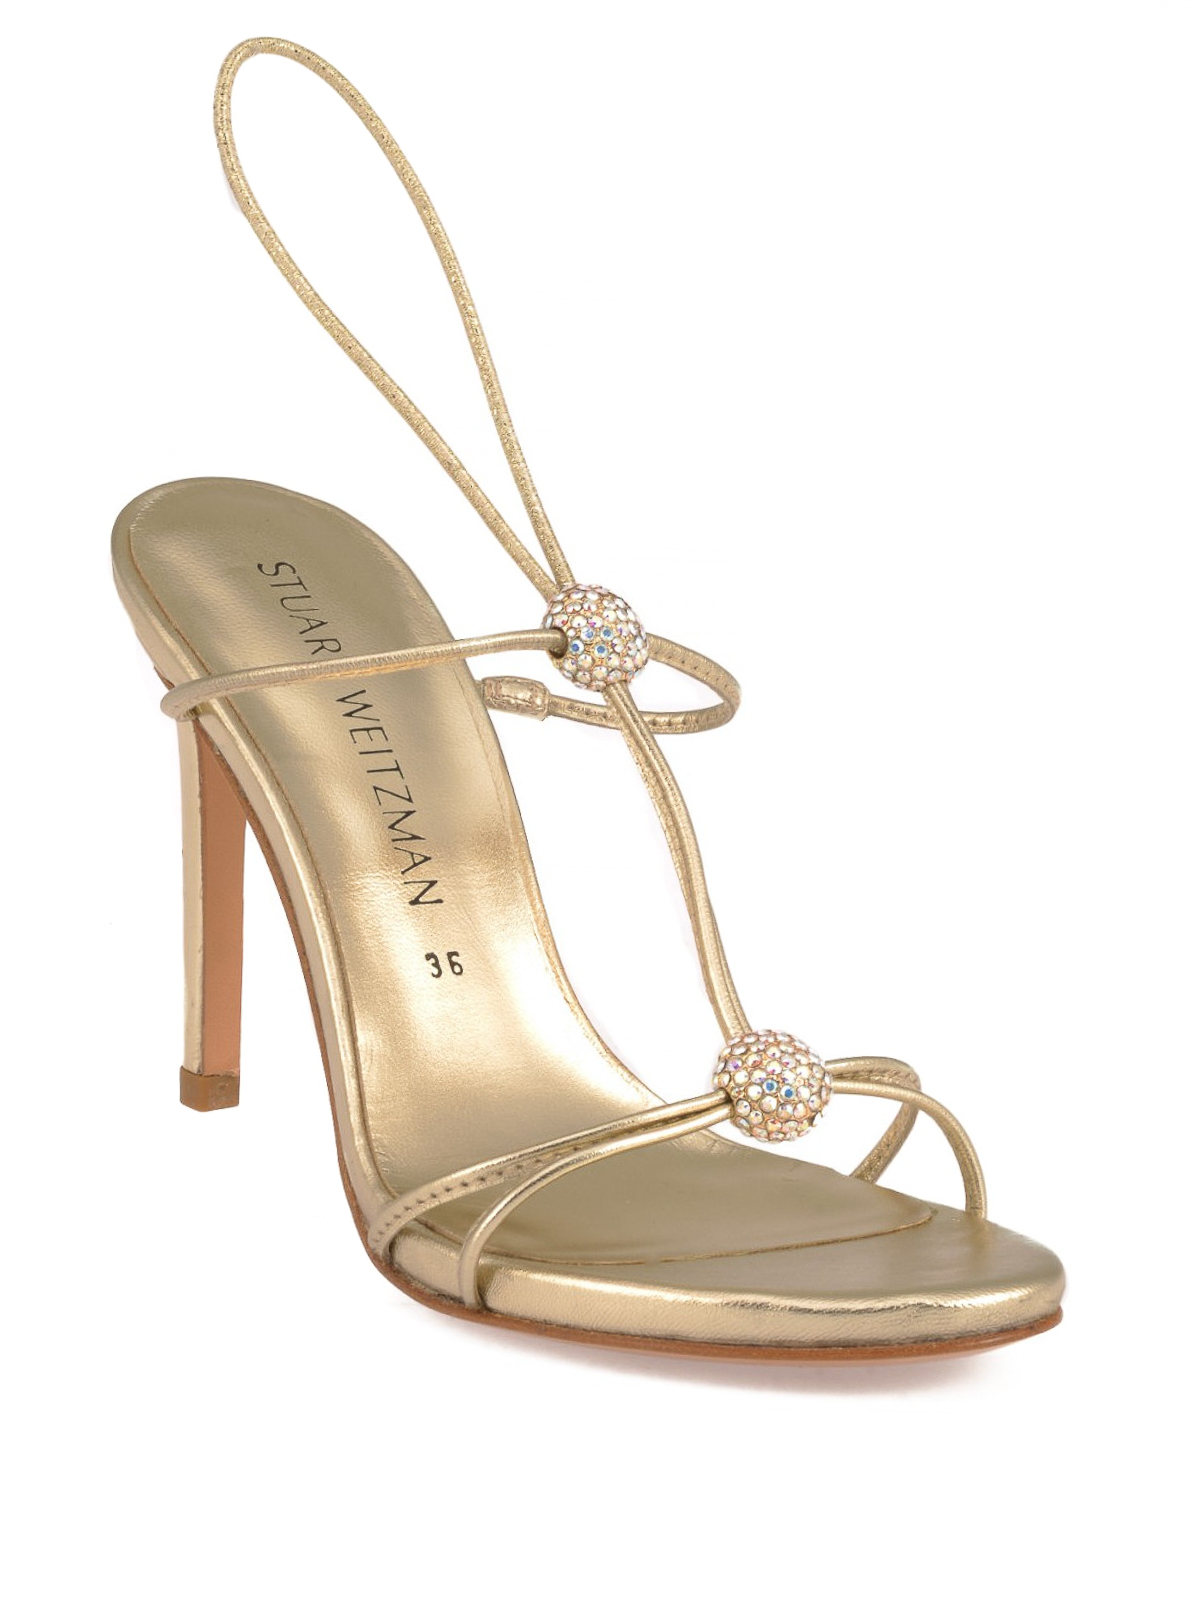 43ff230361a7b Stuart Weitzman  sandals online - Trixie embellished leather sandals